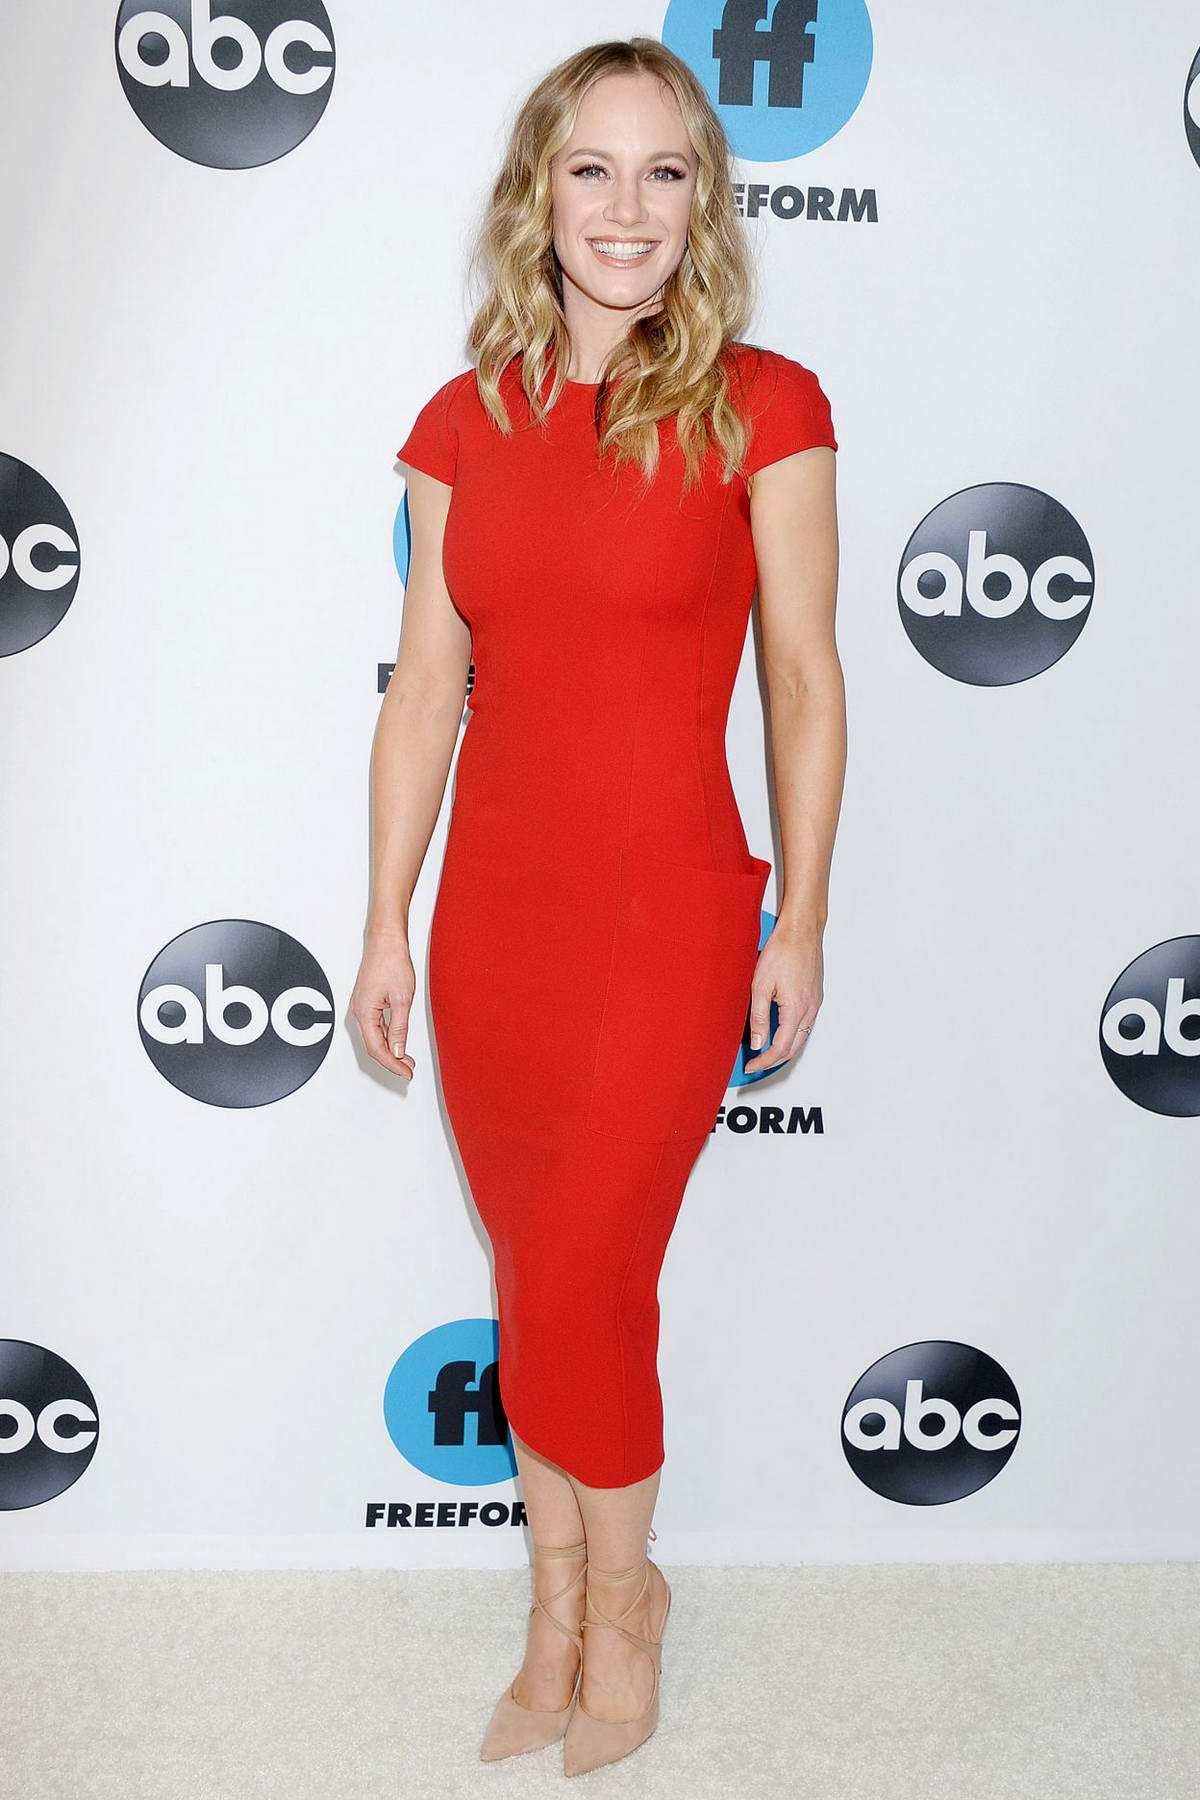 Danielle Savre attends the Freeform's TCA Winter Press Tour in Los Angeles